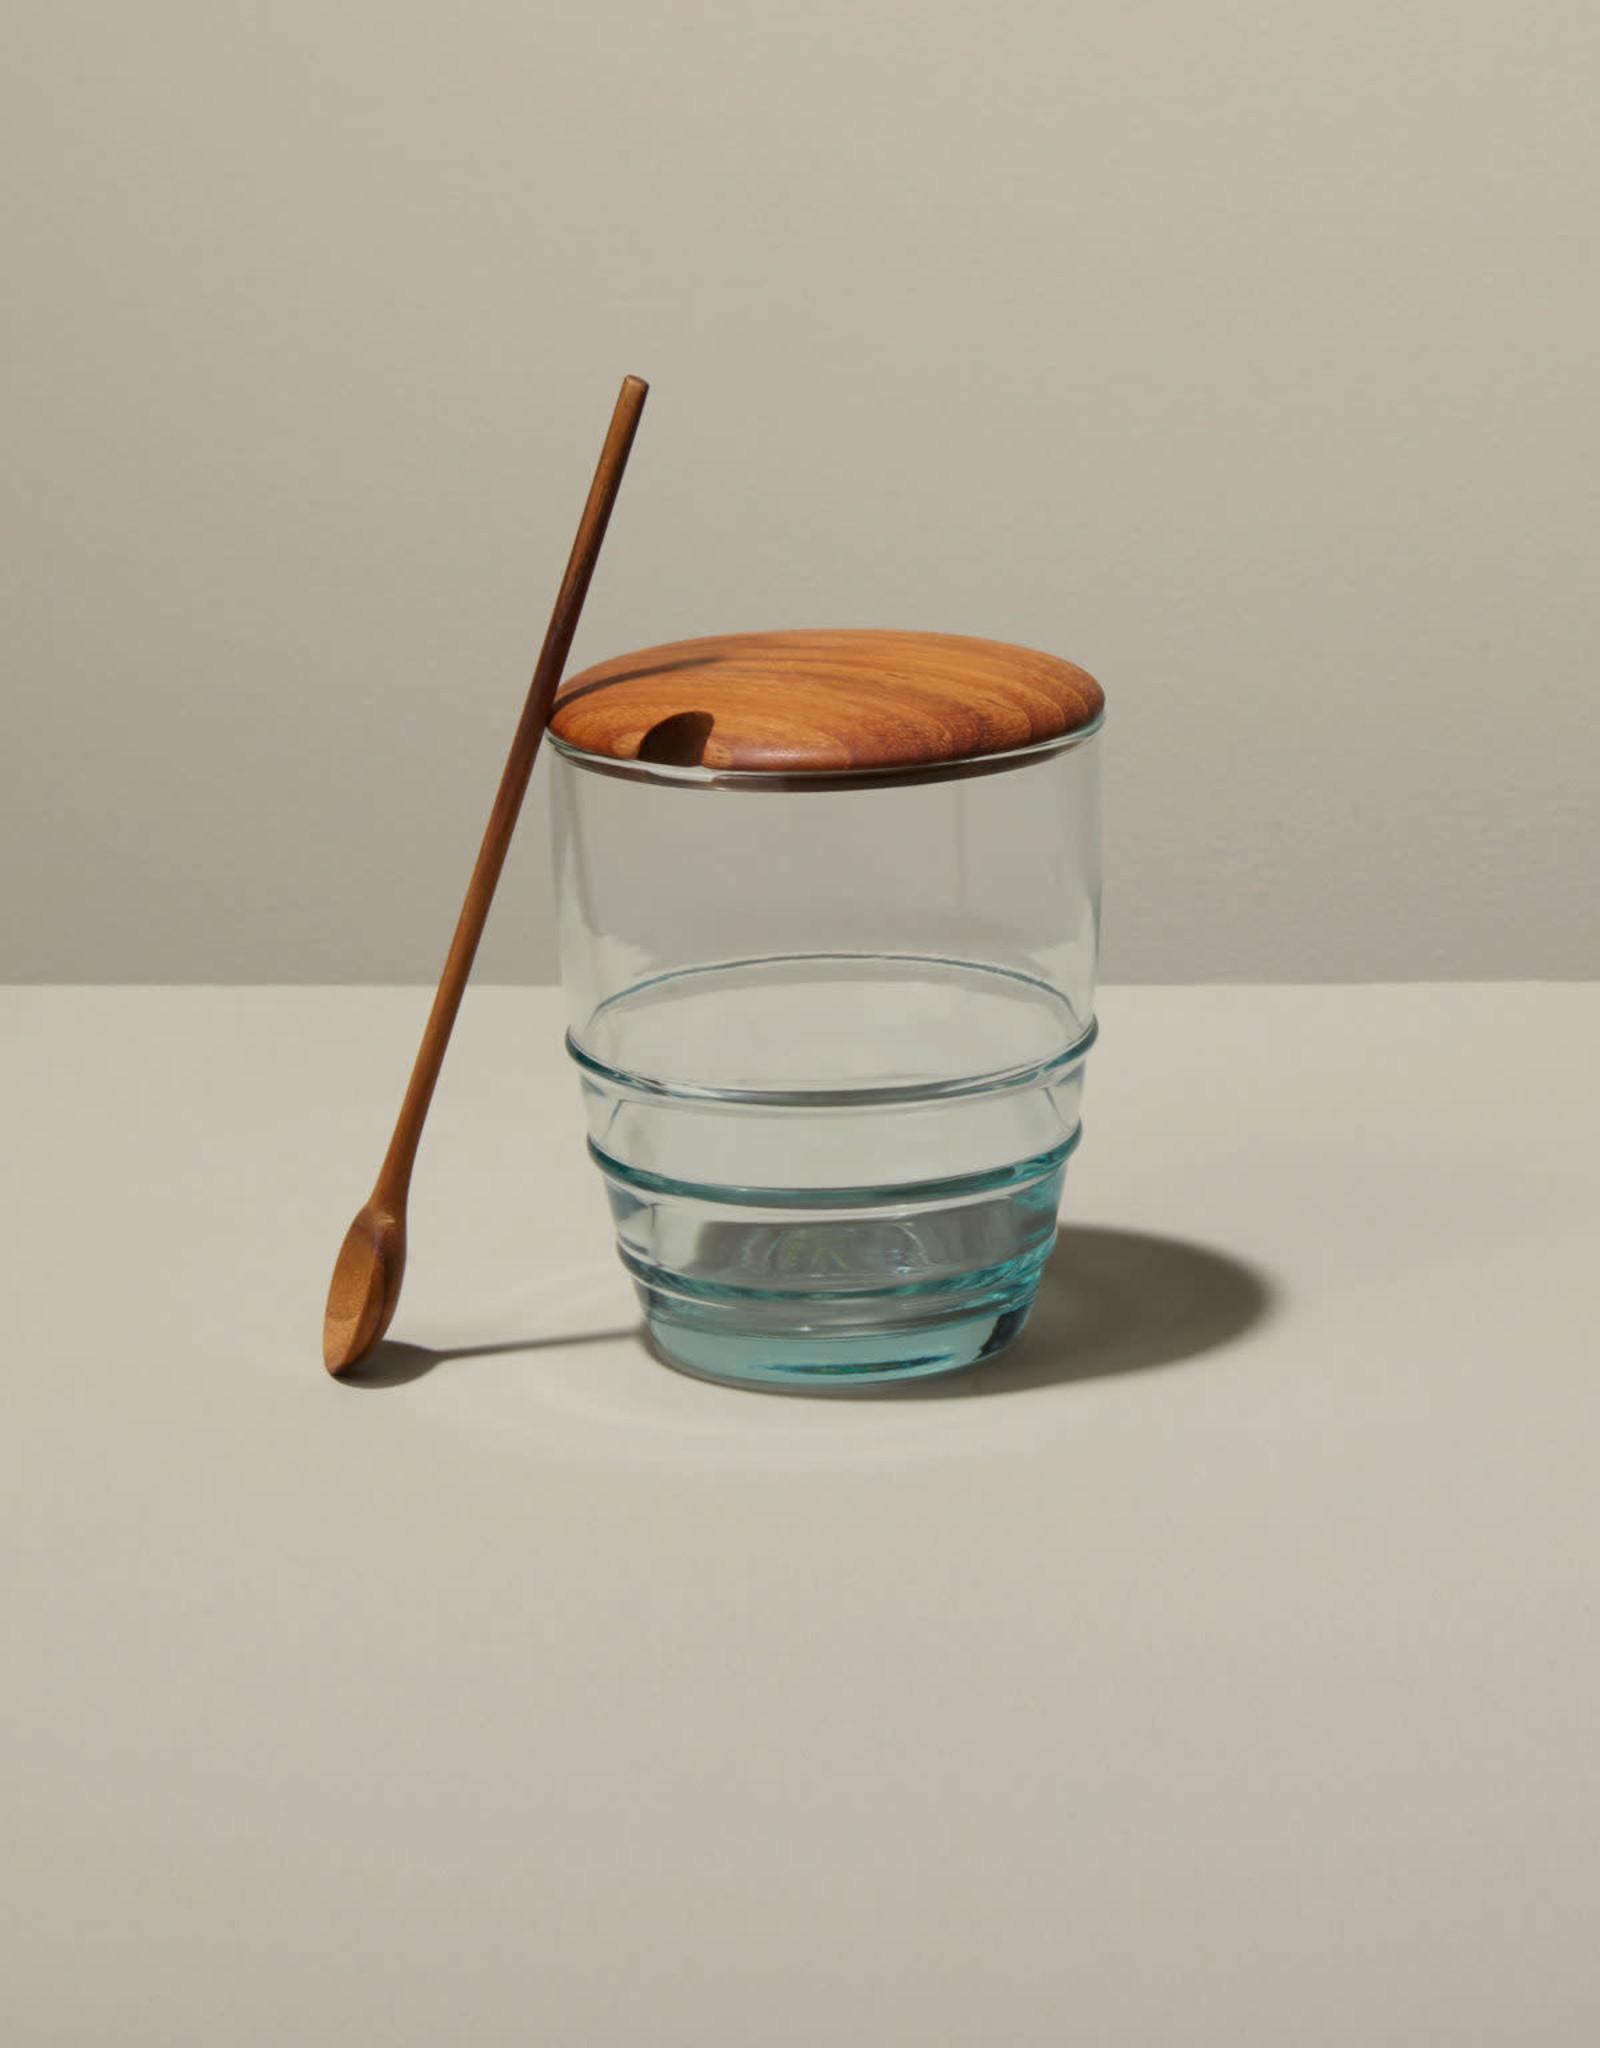 Recycled Glass Jar with Teak Spoon - Reg $33 Now $15